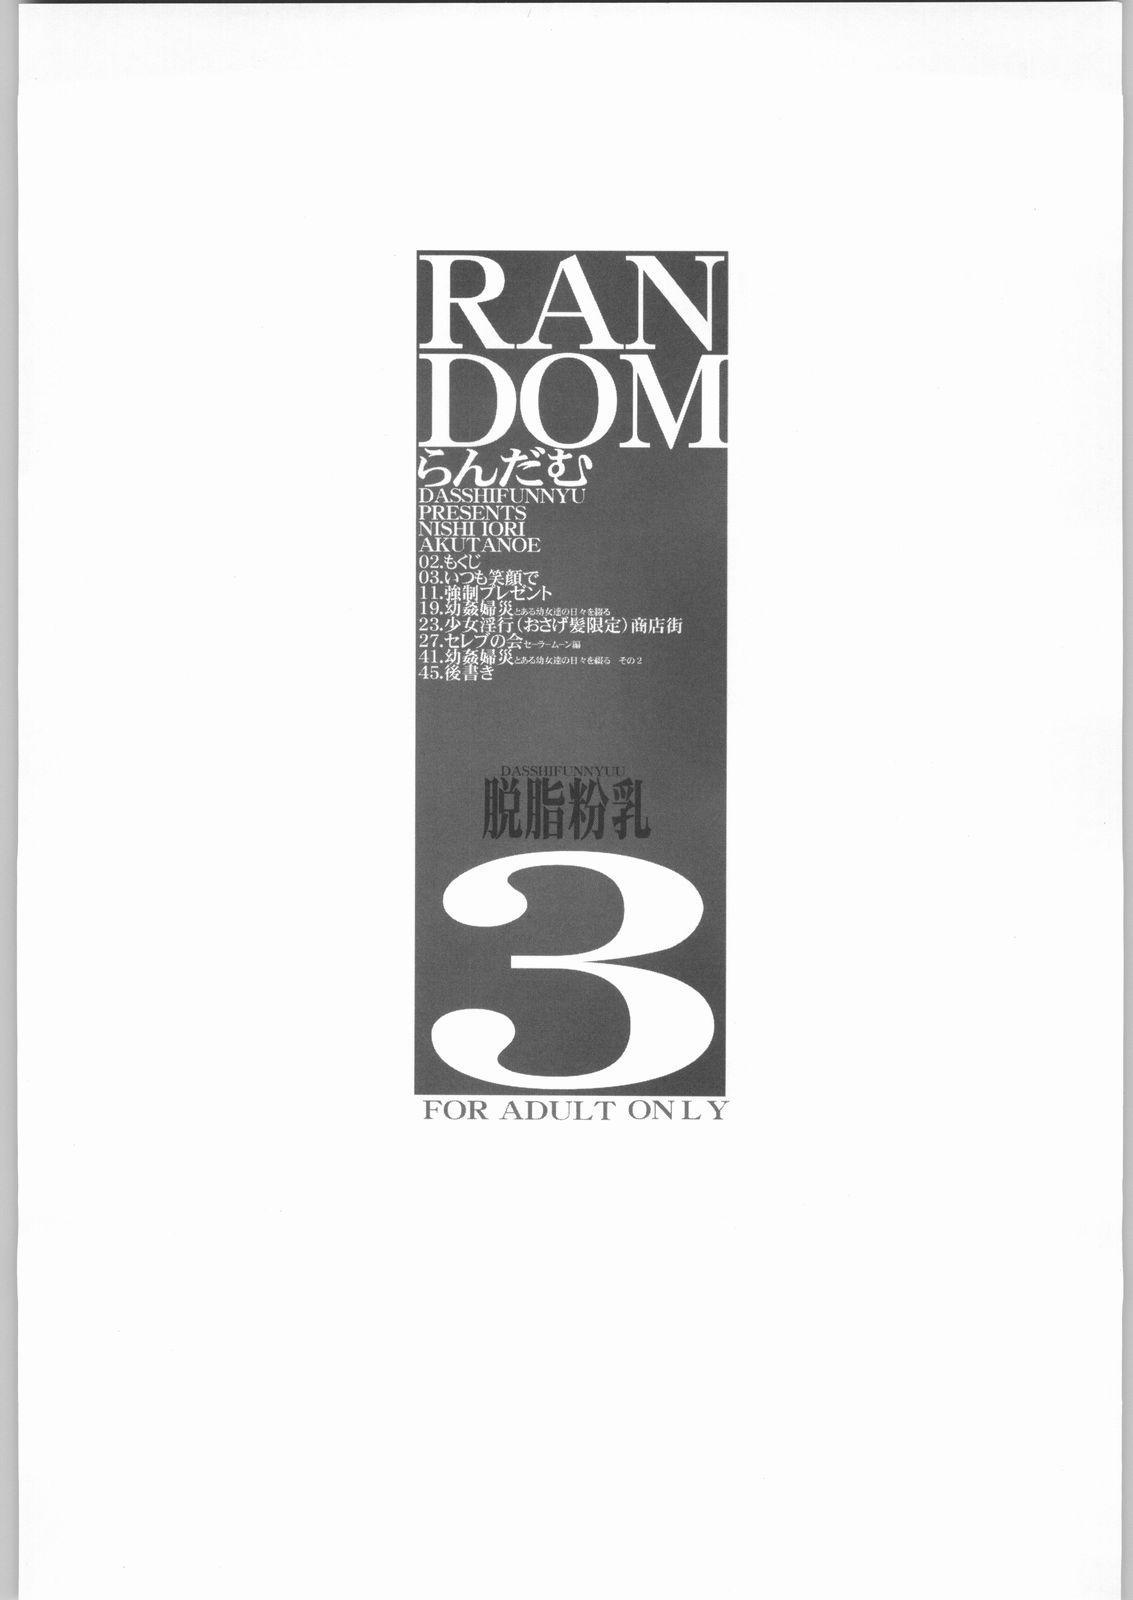 RANDOM 3 2